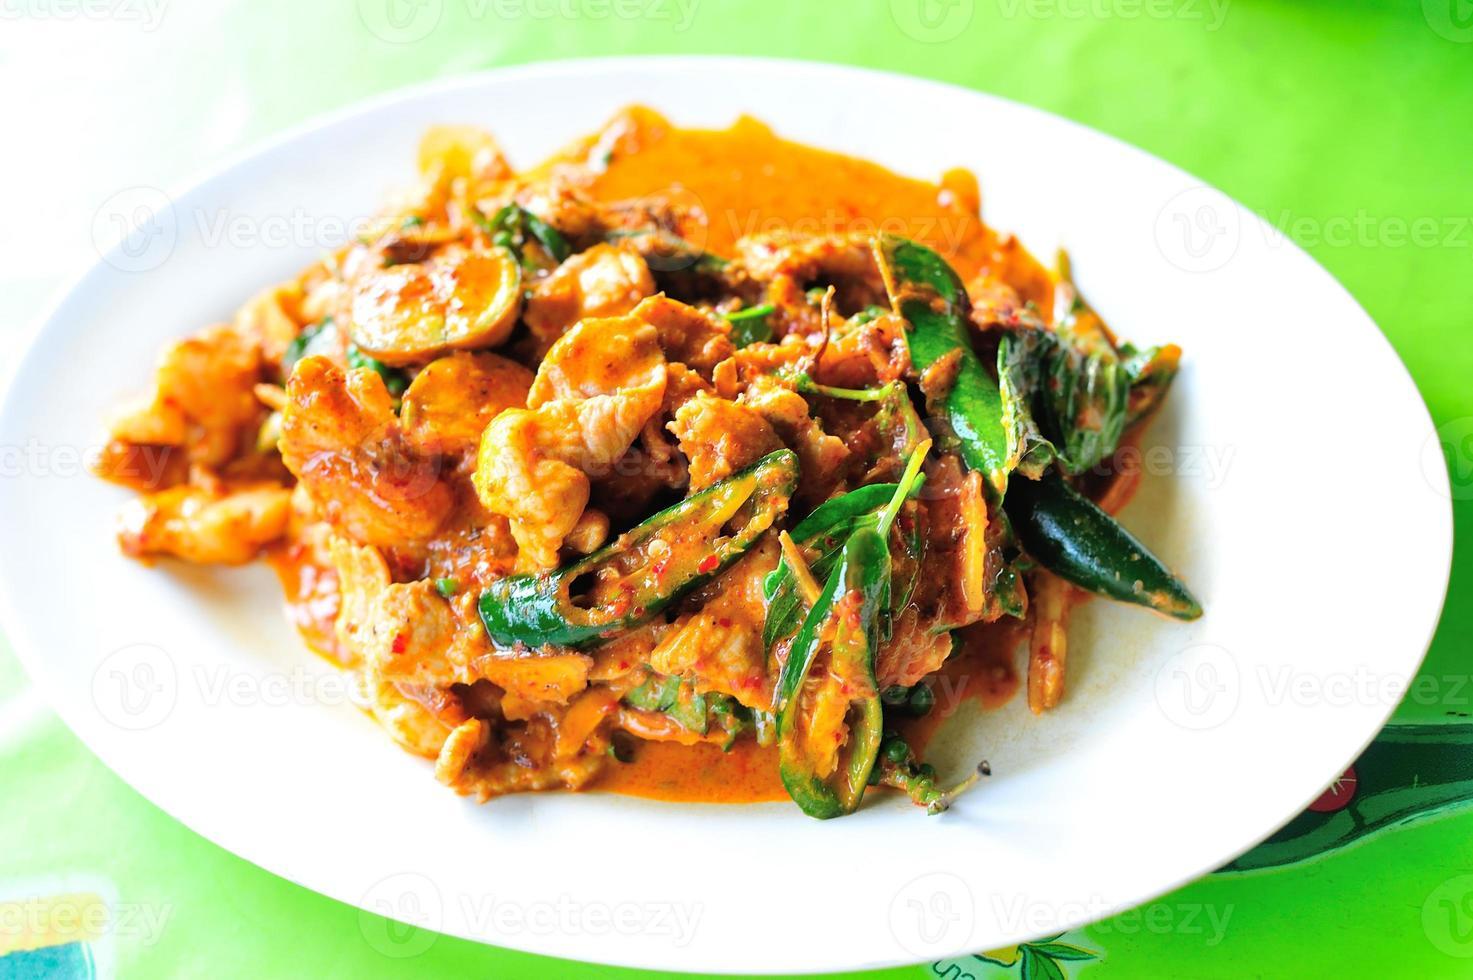 pittig roergebakken varkensvlees met rode curry foto